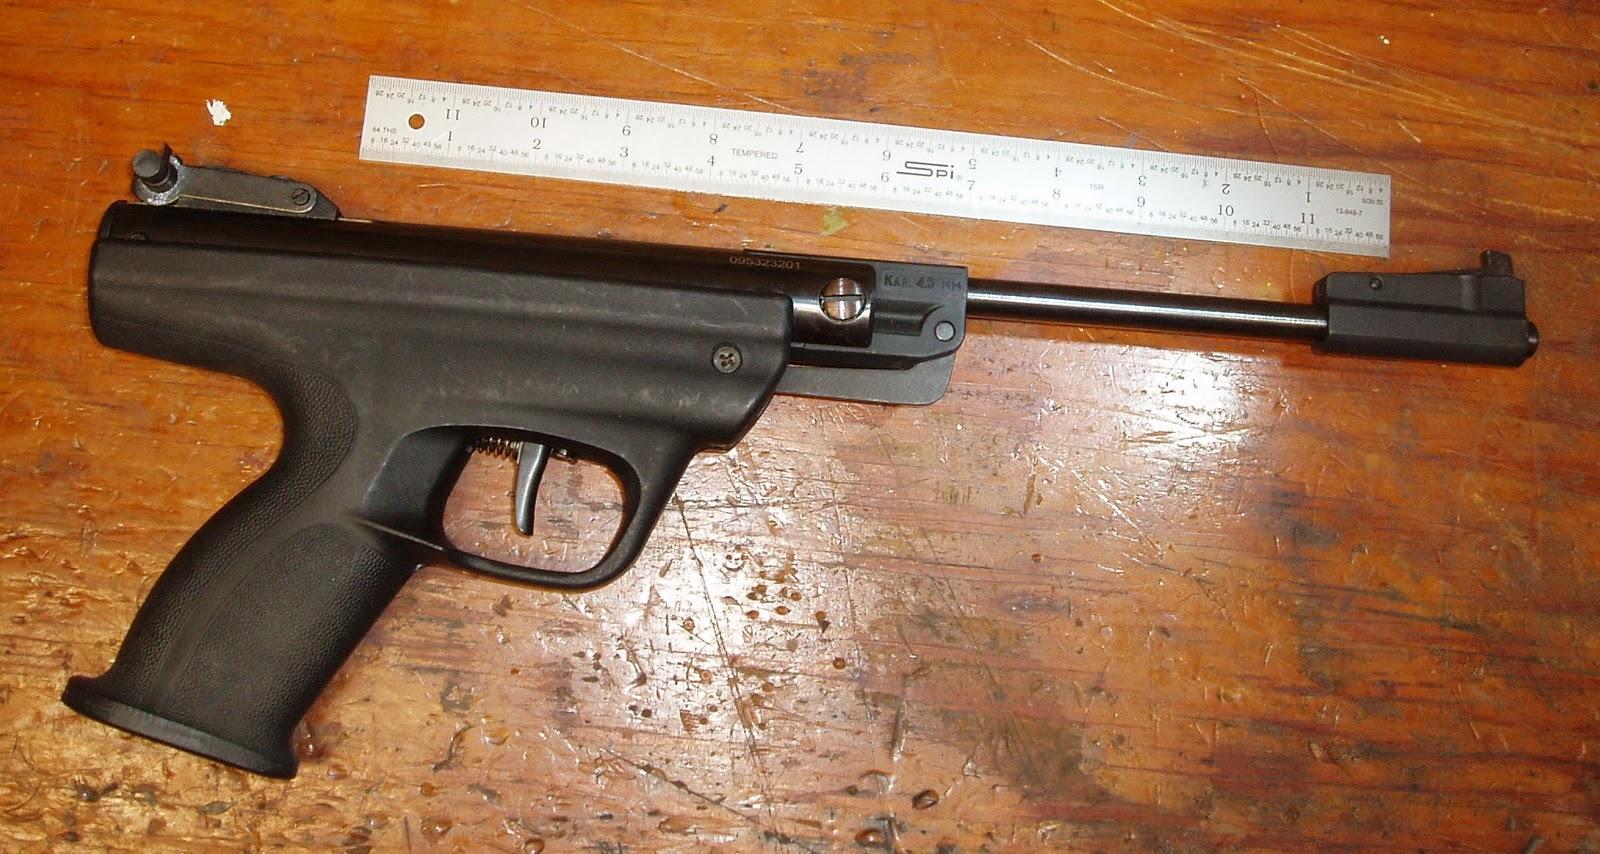 Another Airgun Blog: Overhauling the IZH 53M Part 1